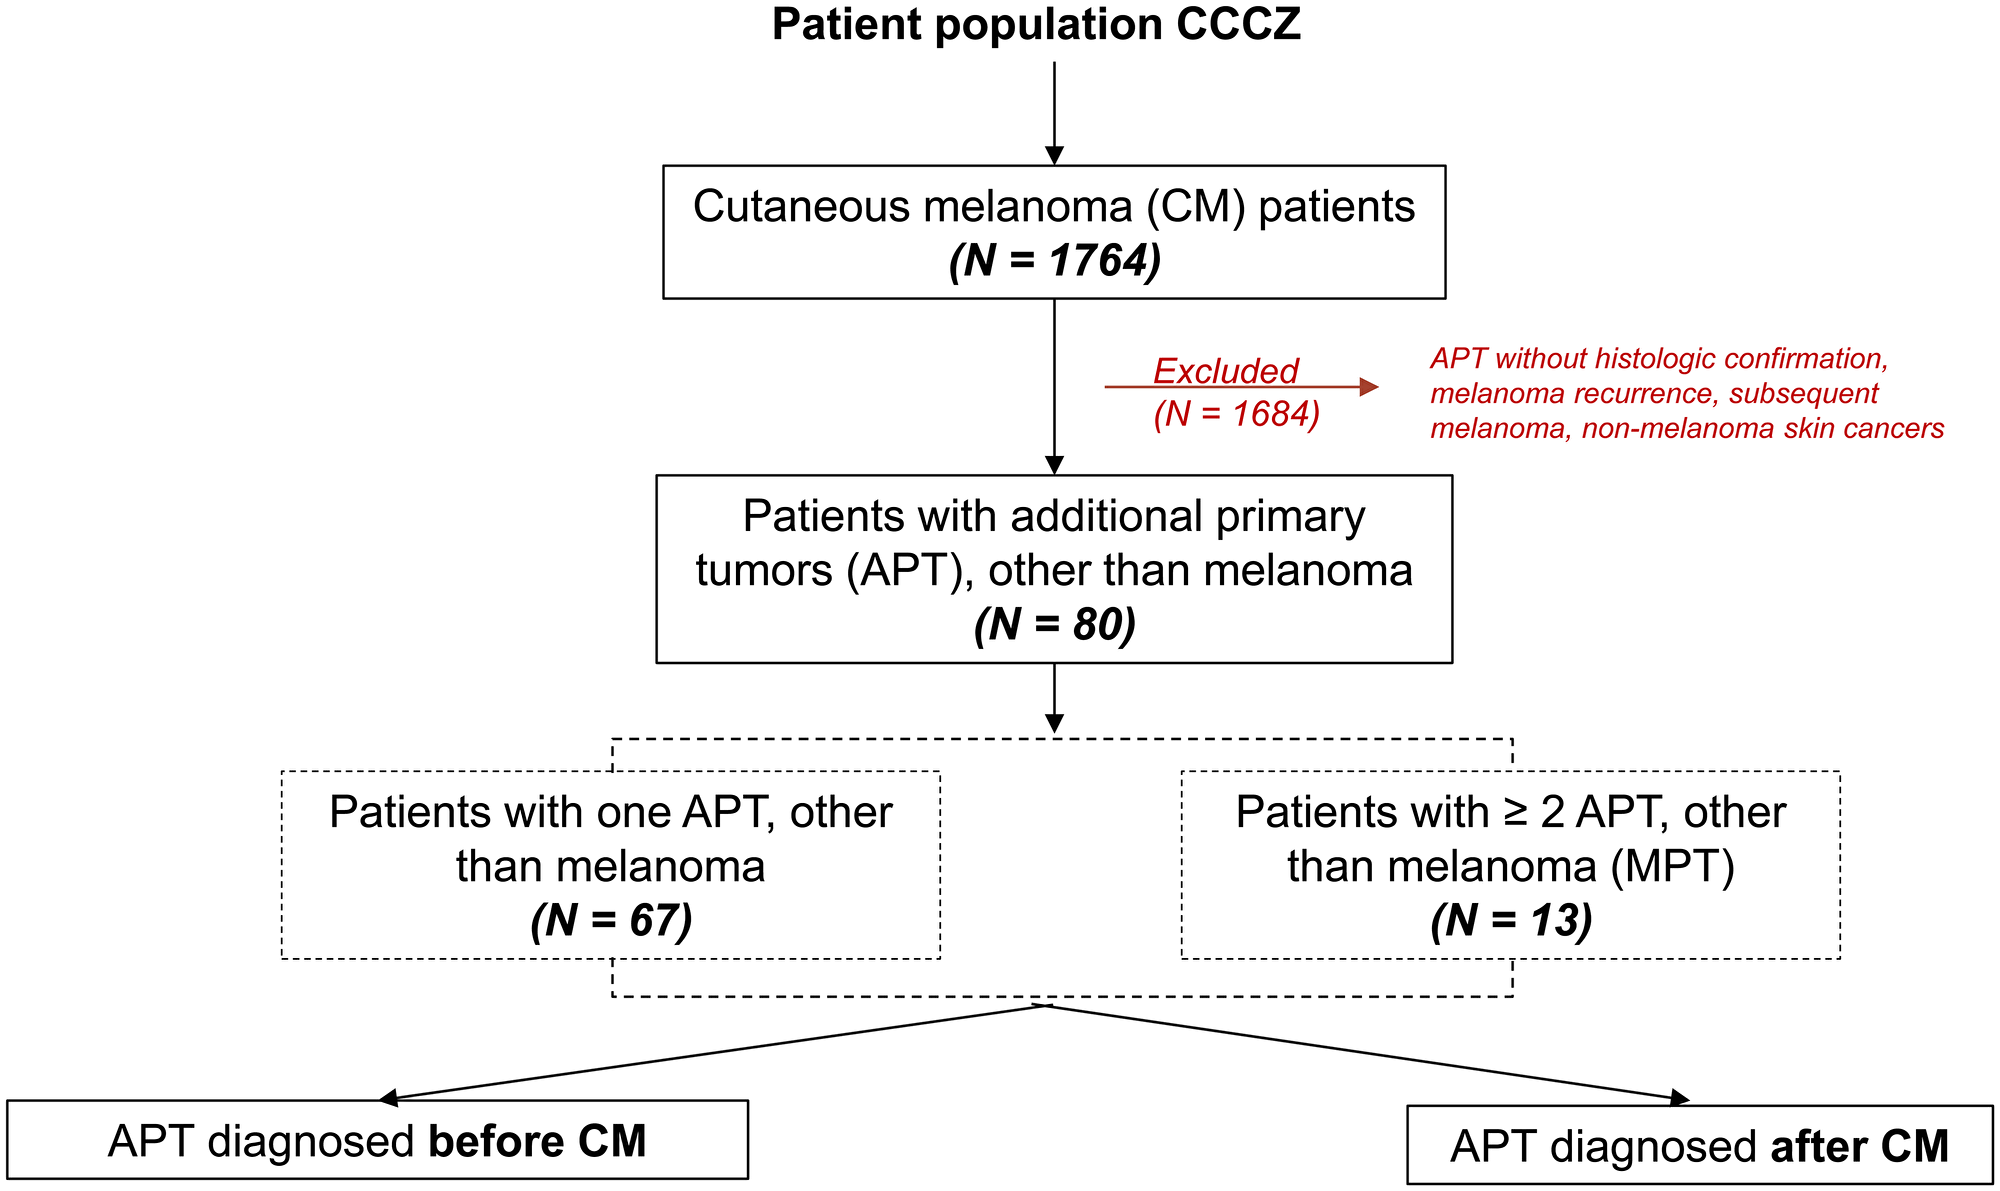 Patient population, CCCZ: Comprehensive Cancer Center Zurich.